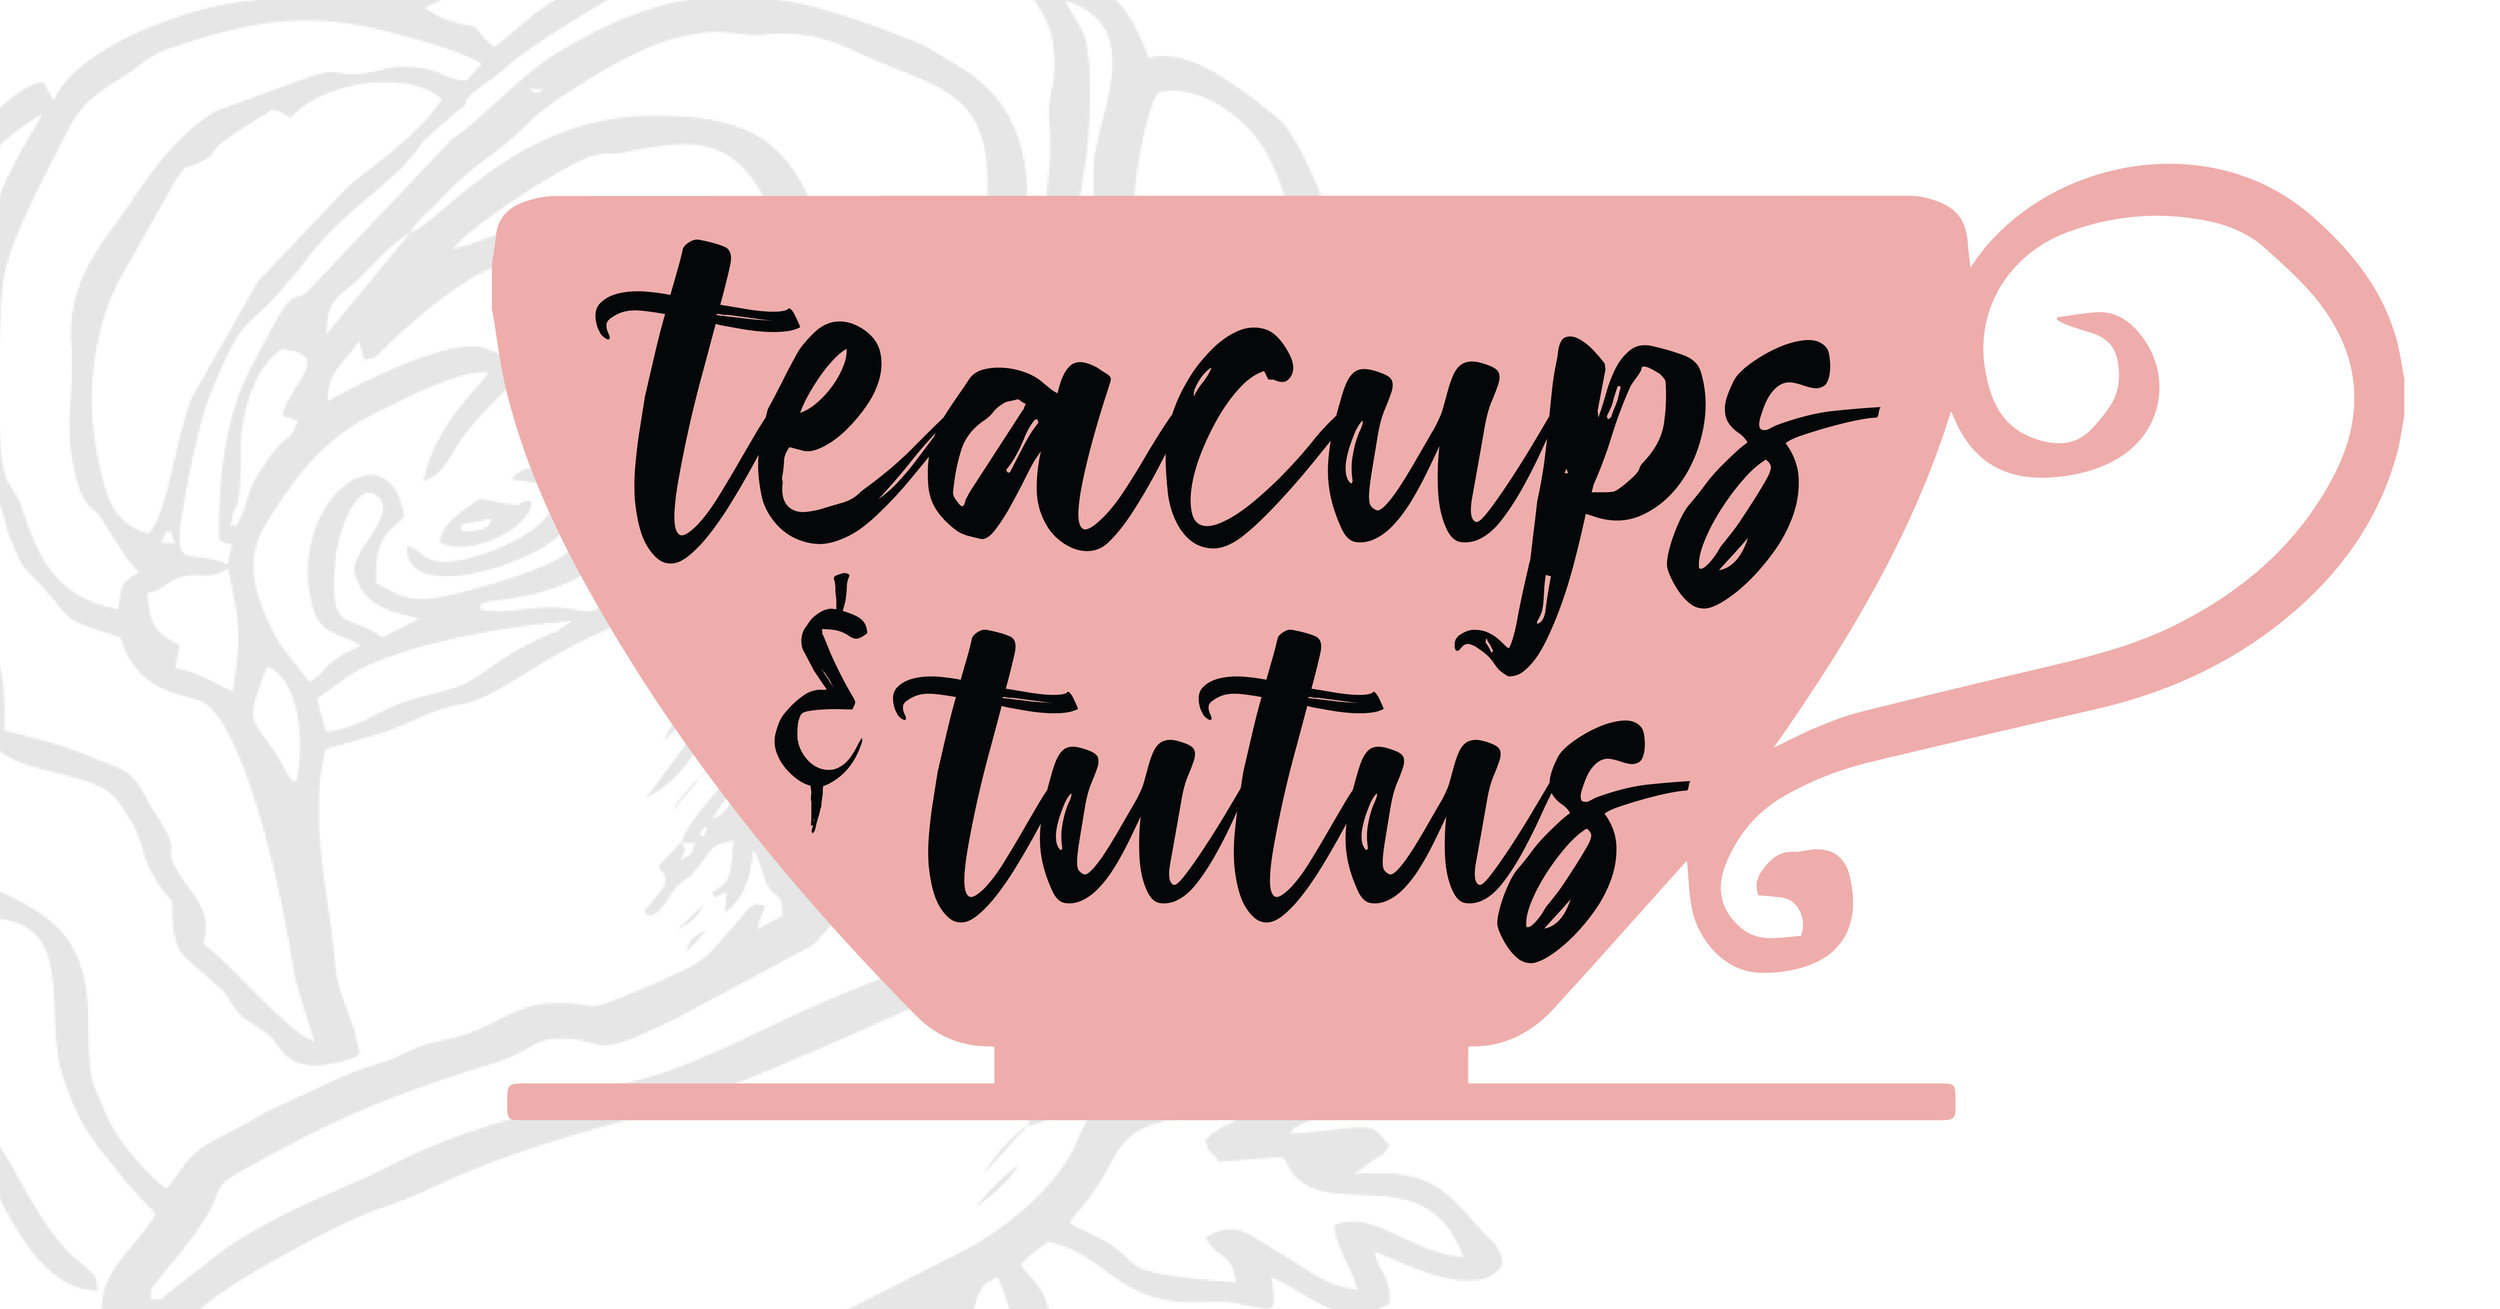 TeacupsTutus_FBEventBanner-01.jpg